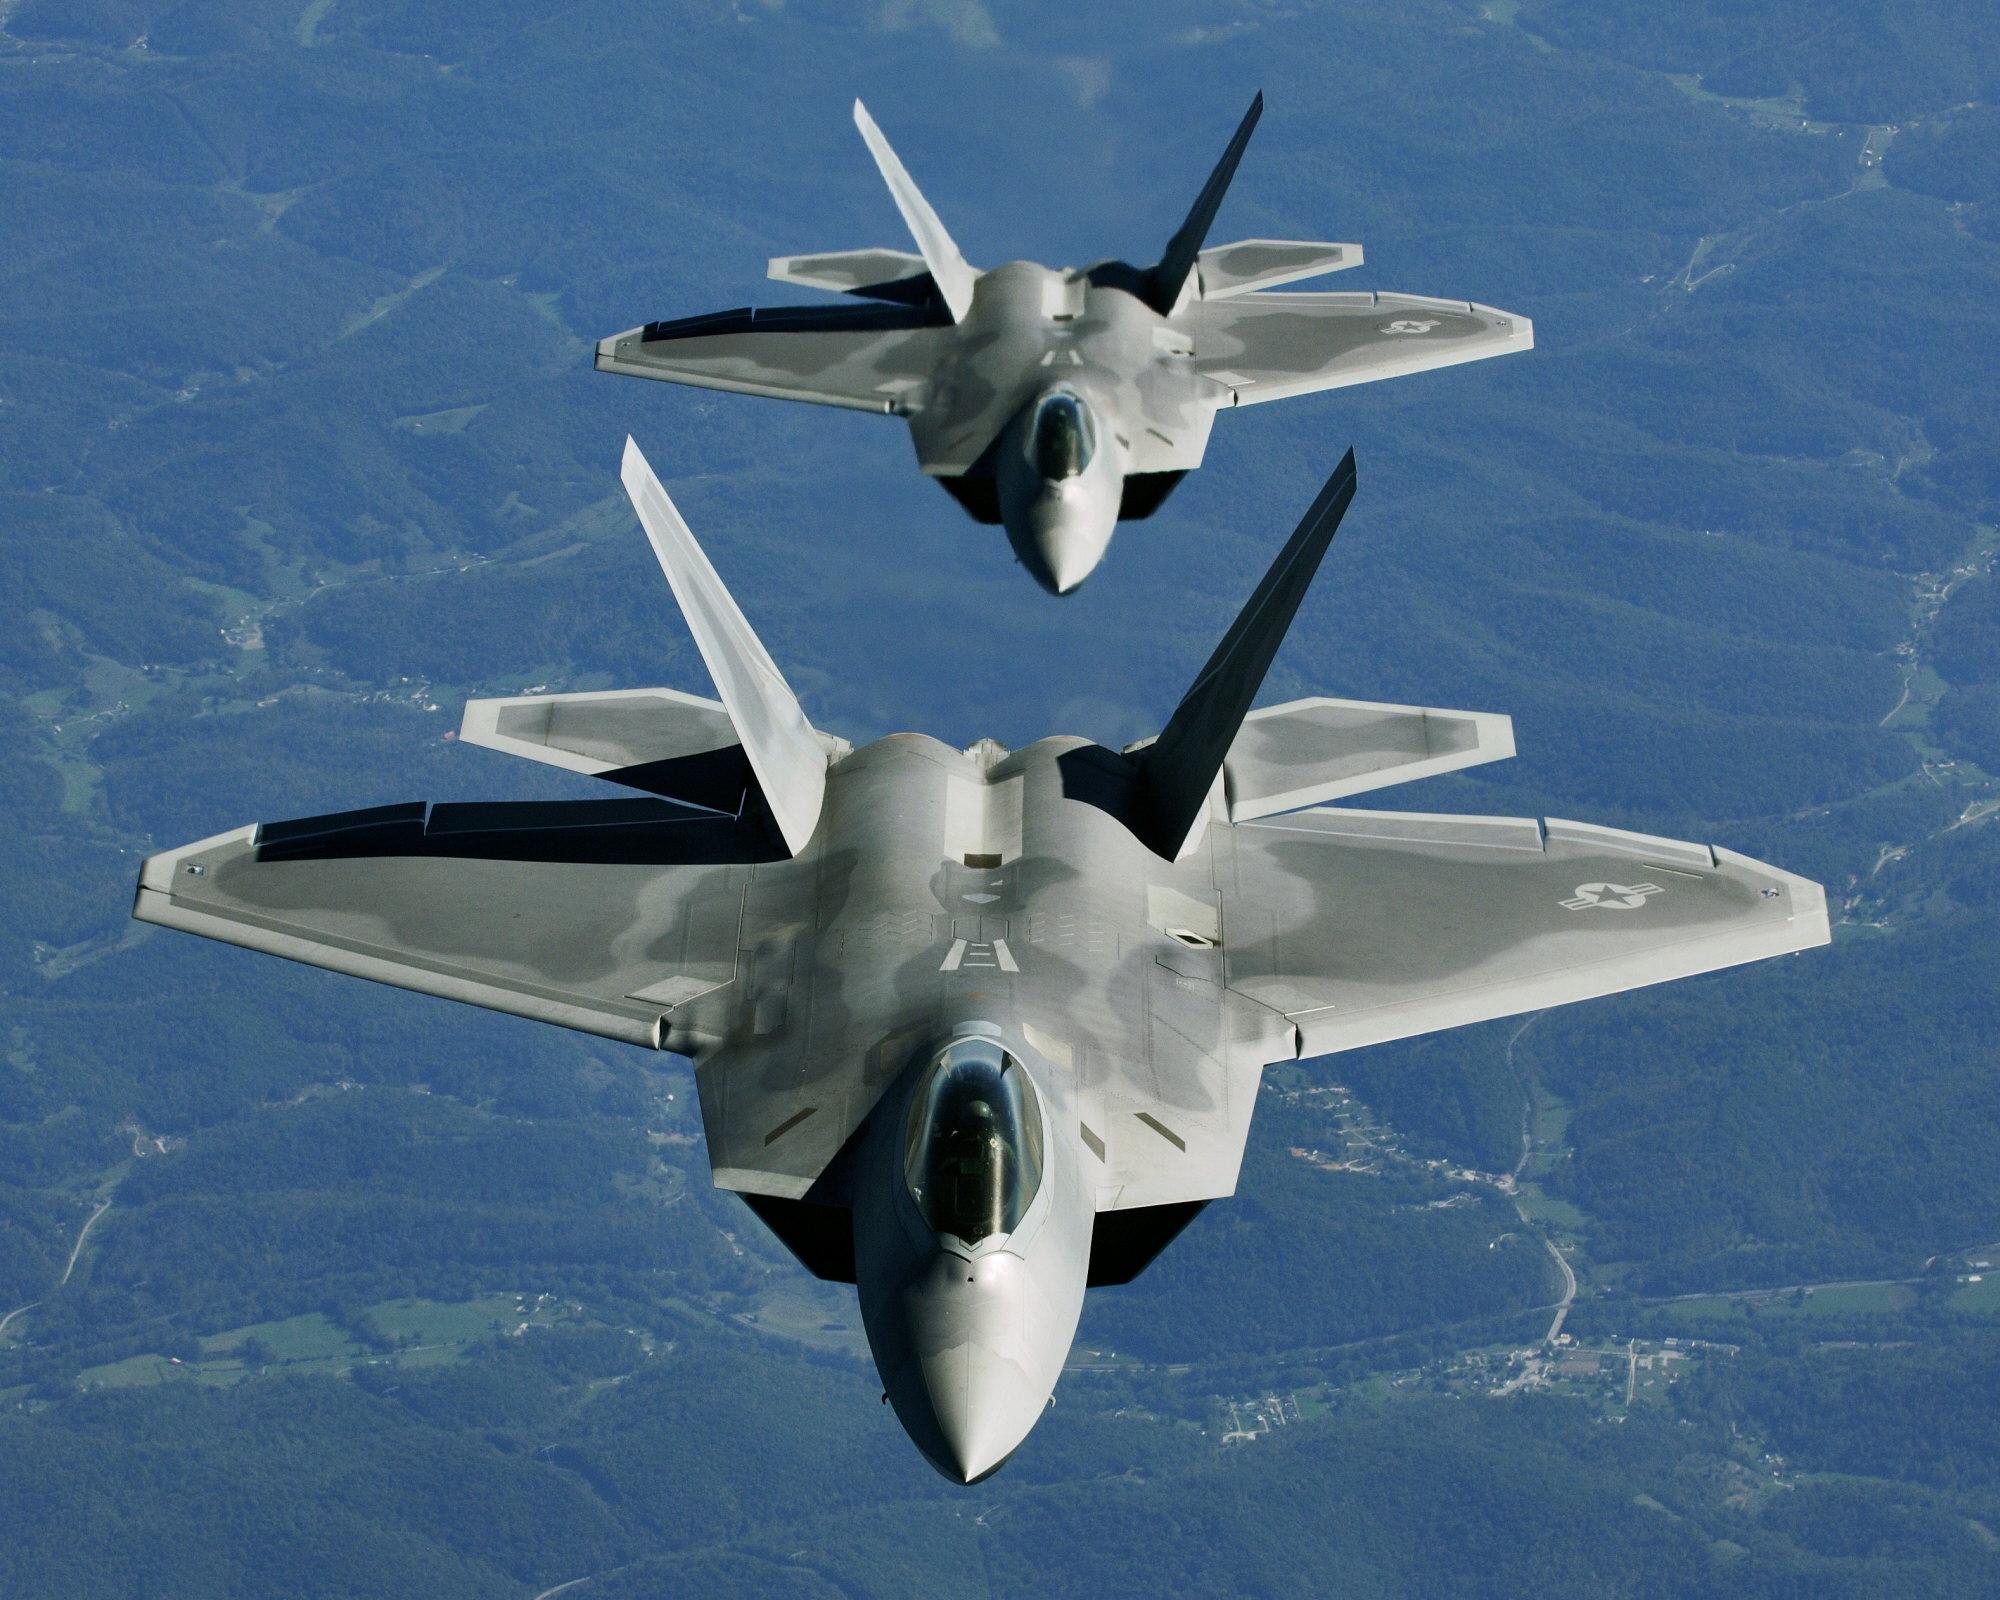 F-22 Raptor - Page 2 051015-F-2295B-043